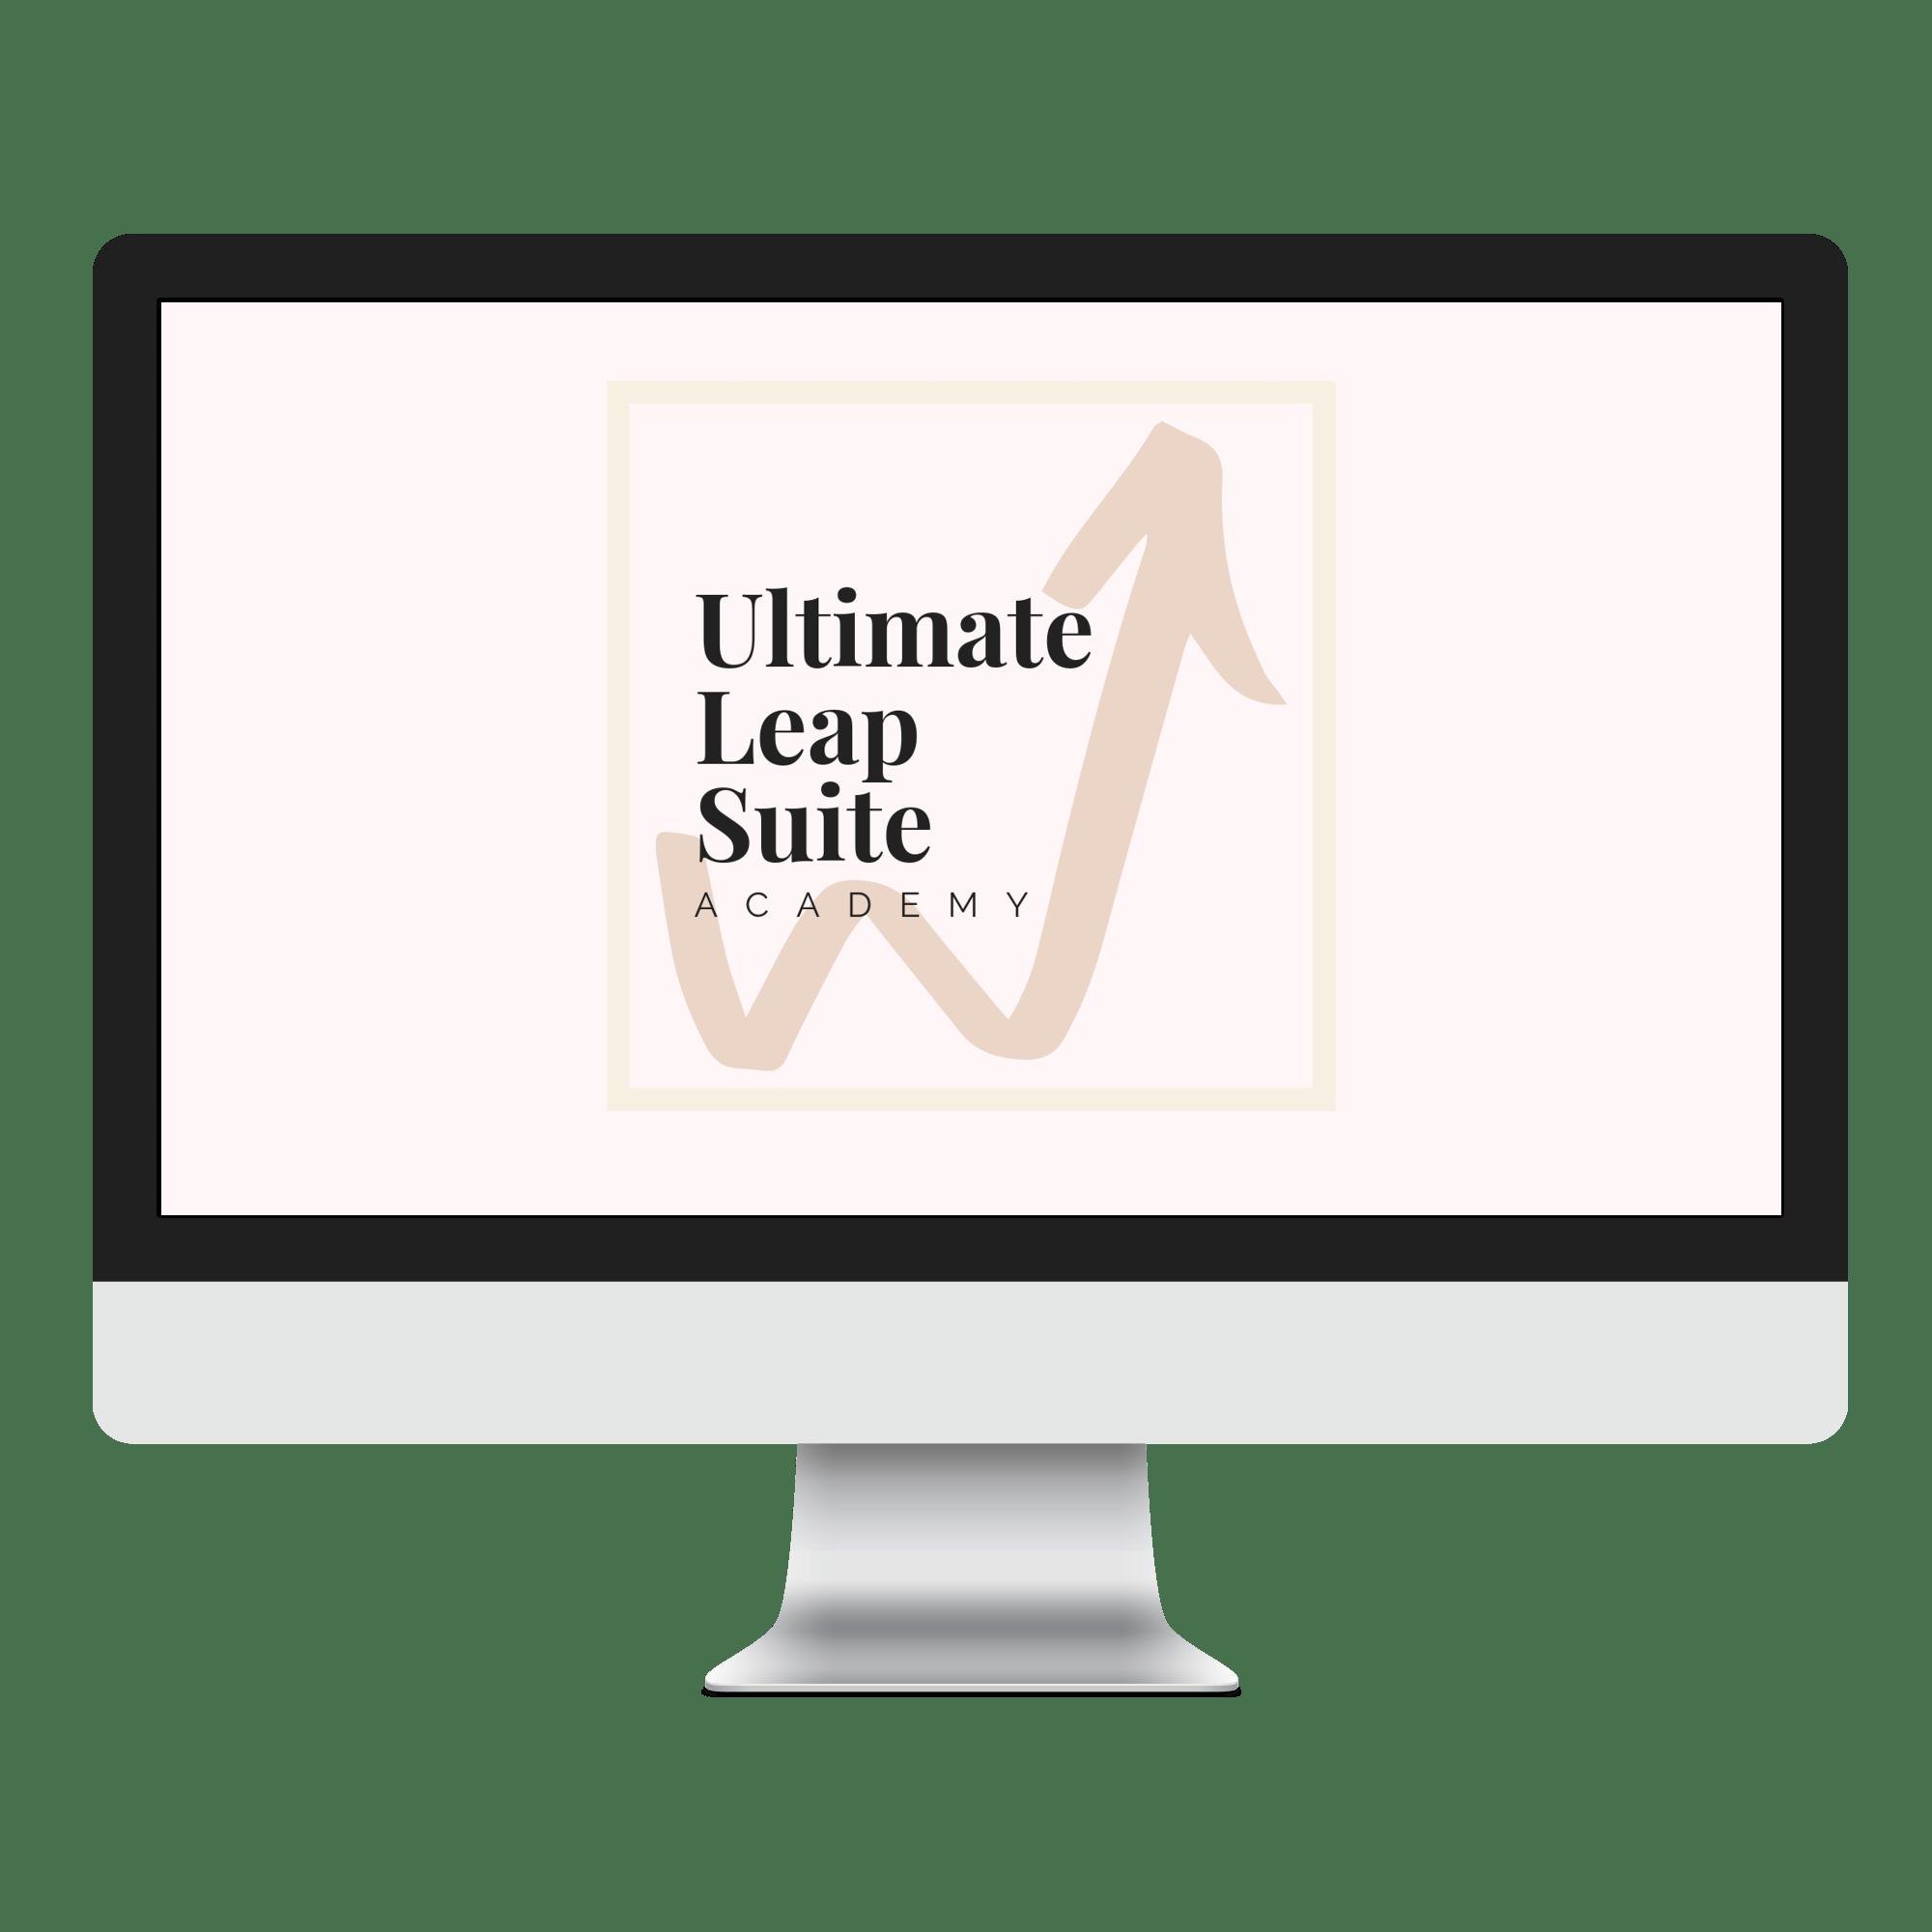 Ultimate Leap Suite Academy Logo